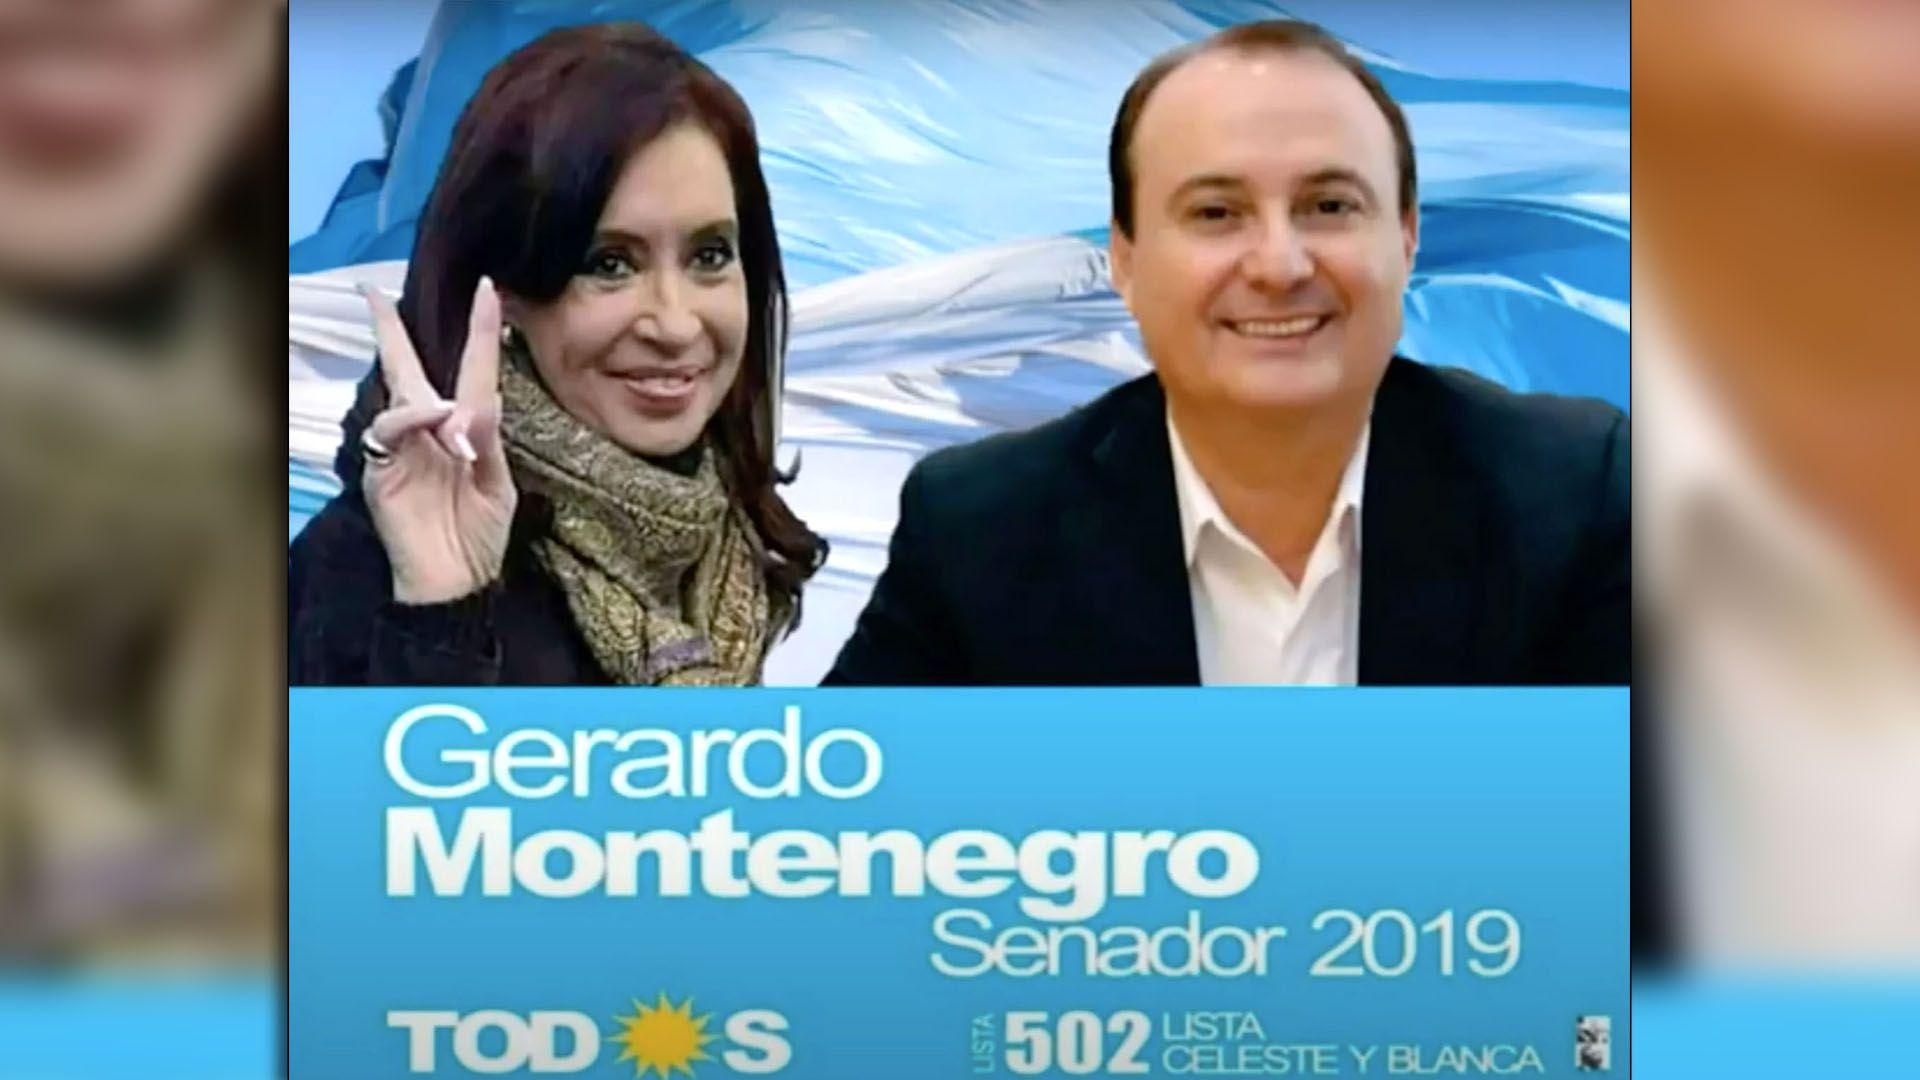 Gerardo-Montenegro cristina kirchner portada